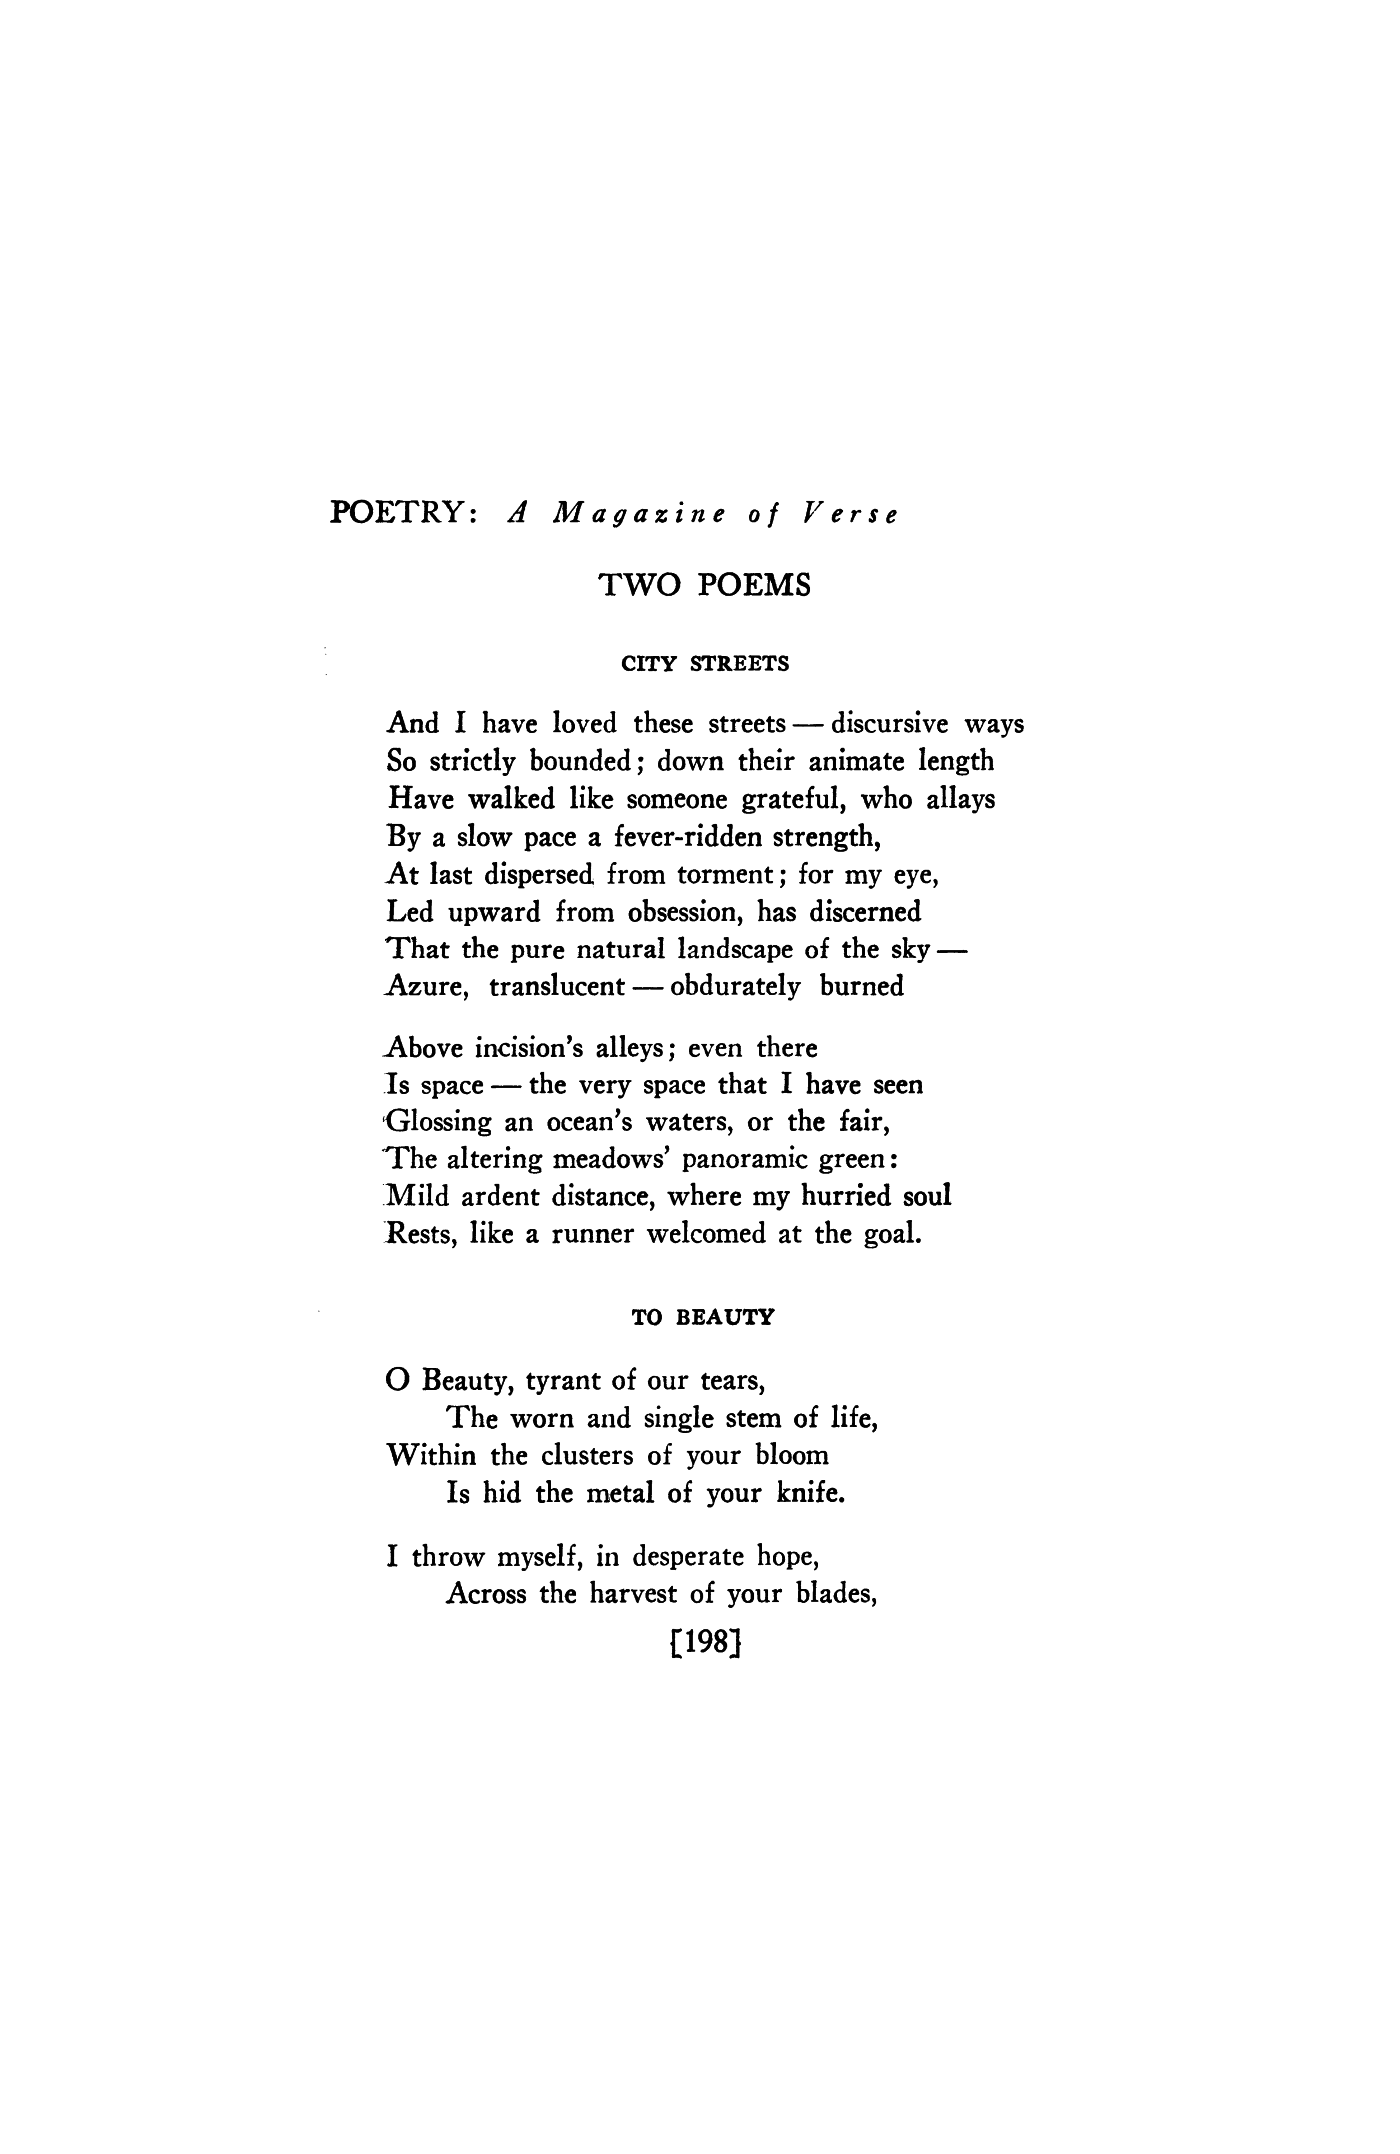 January 1936